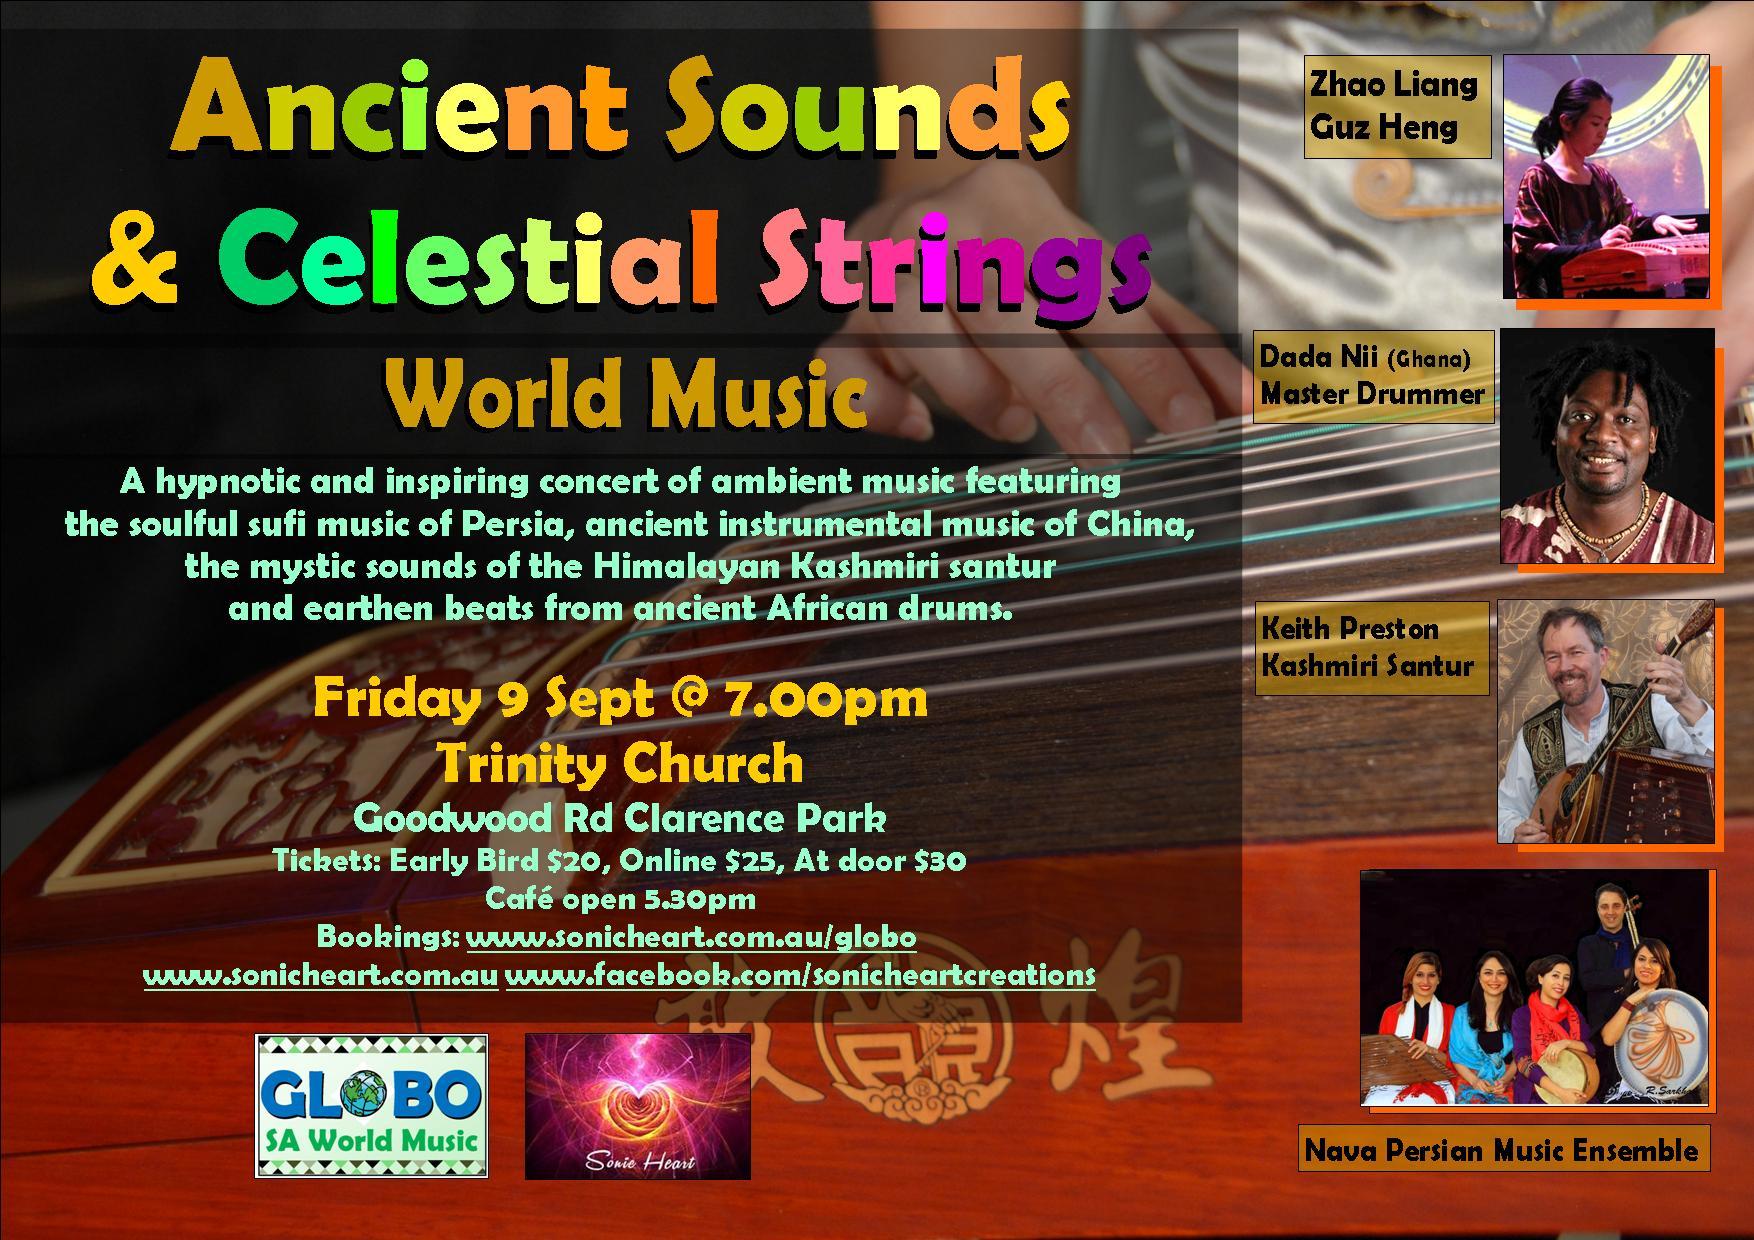 Ancient Sounds & Celestial Strings